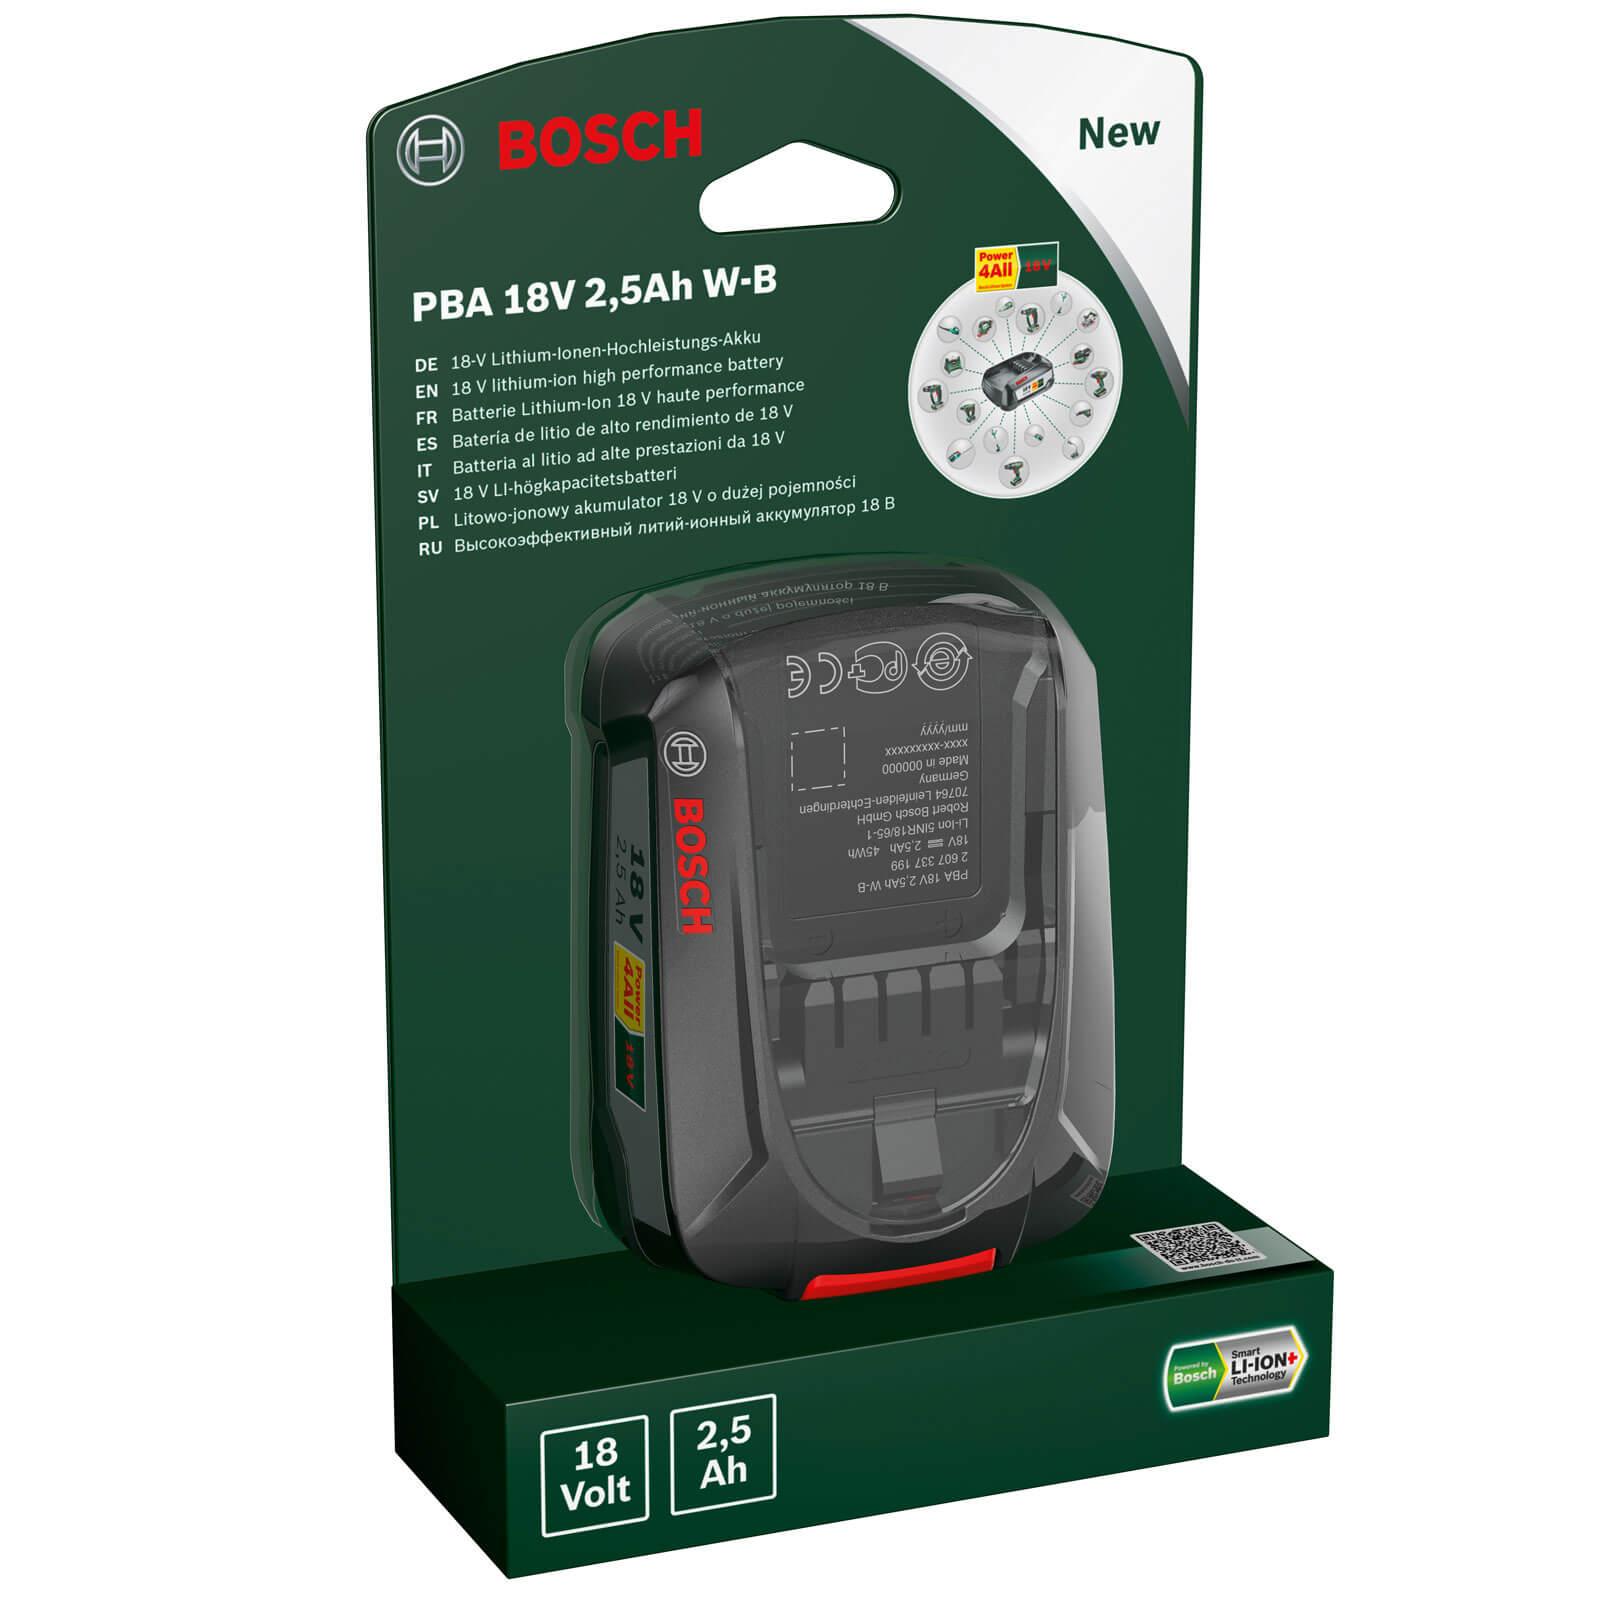 Bosch Genuine POWER4ALL PBA W B 18v Cordless Li ion Battery